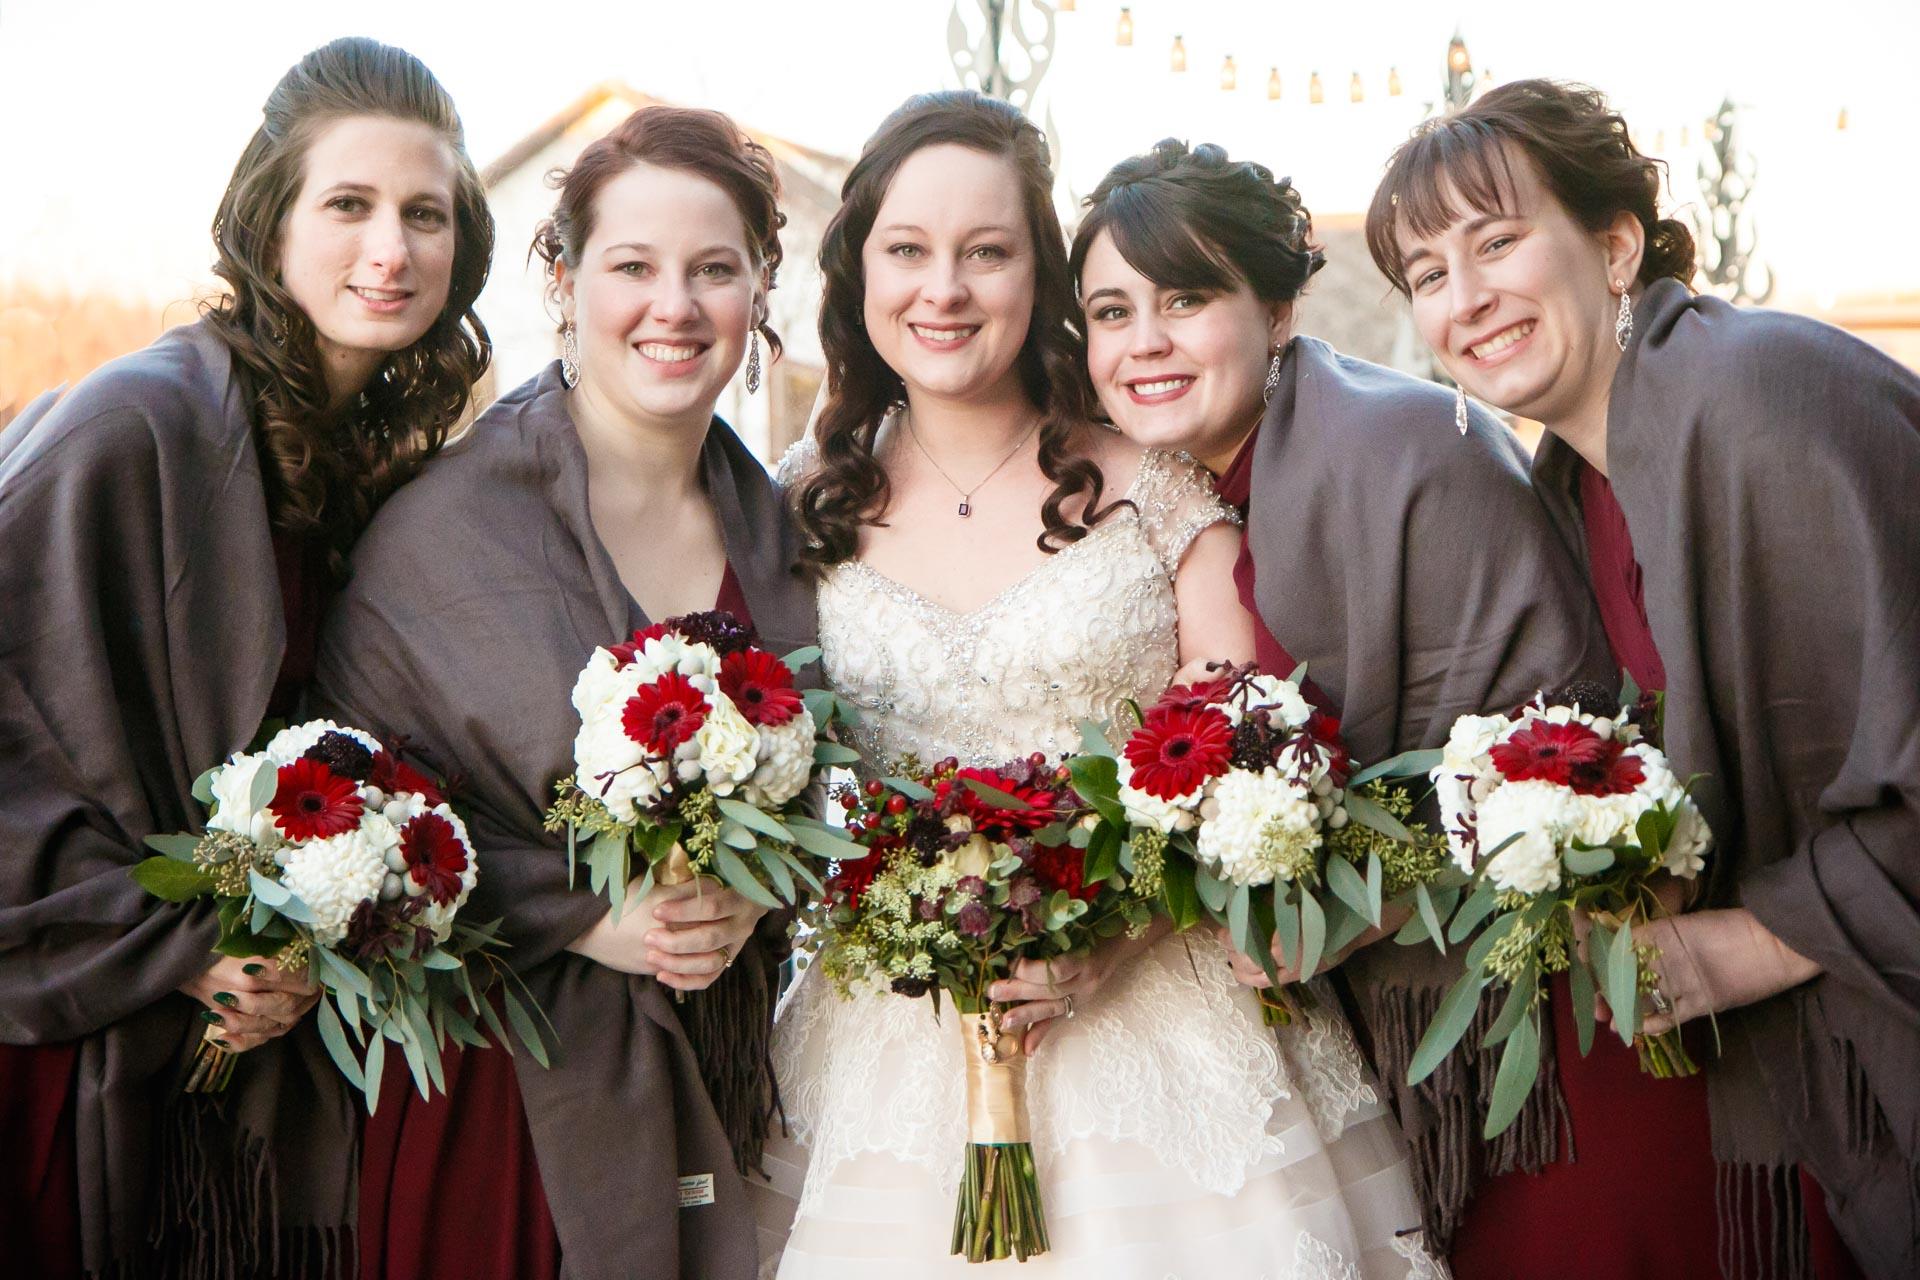 wedding-adam-shea-photography-green-bay-appleton-neenah-photographer-22.jpg